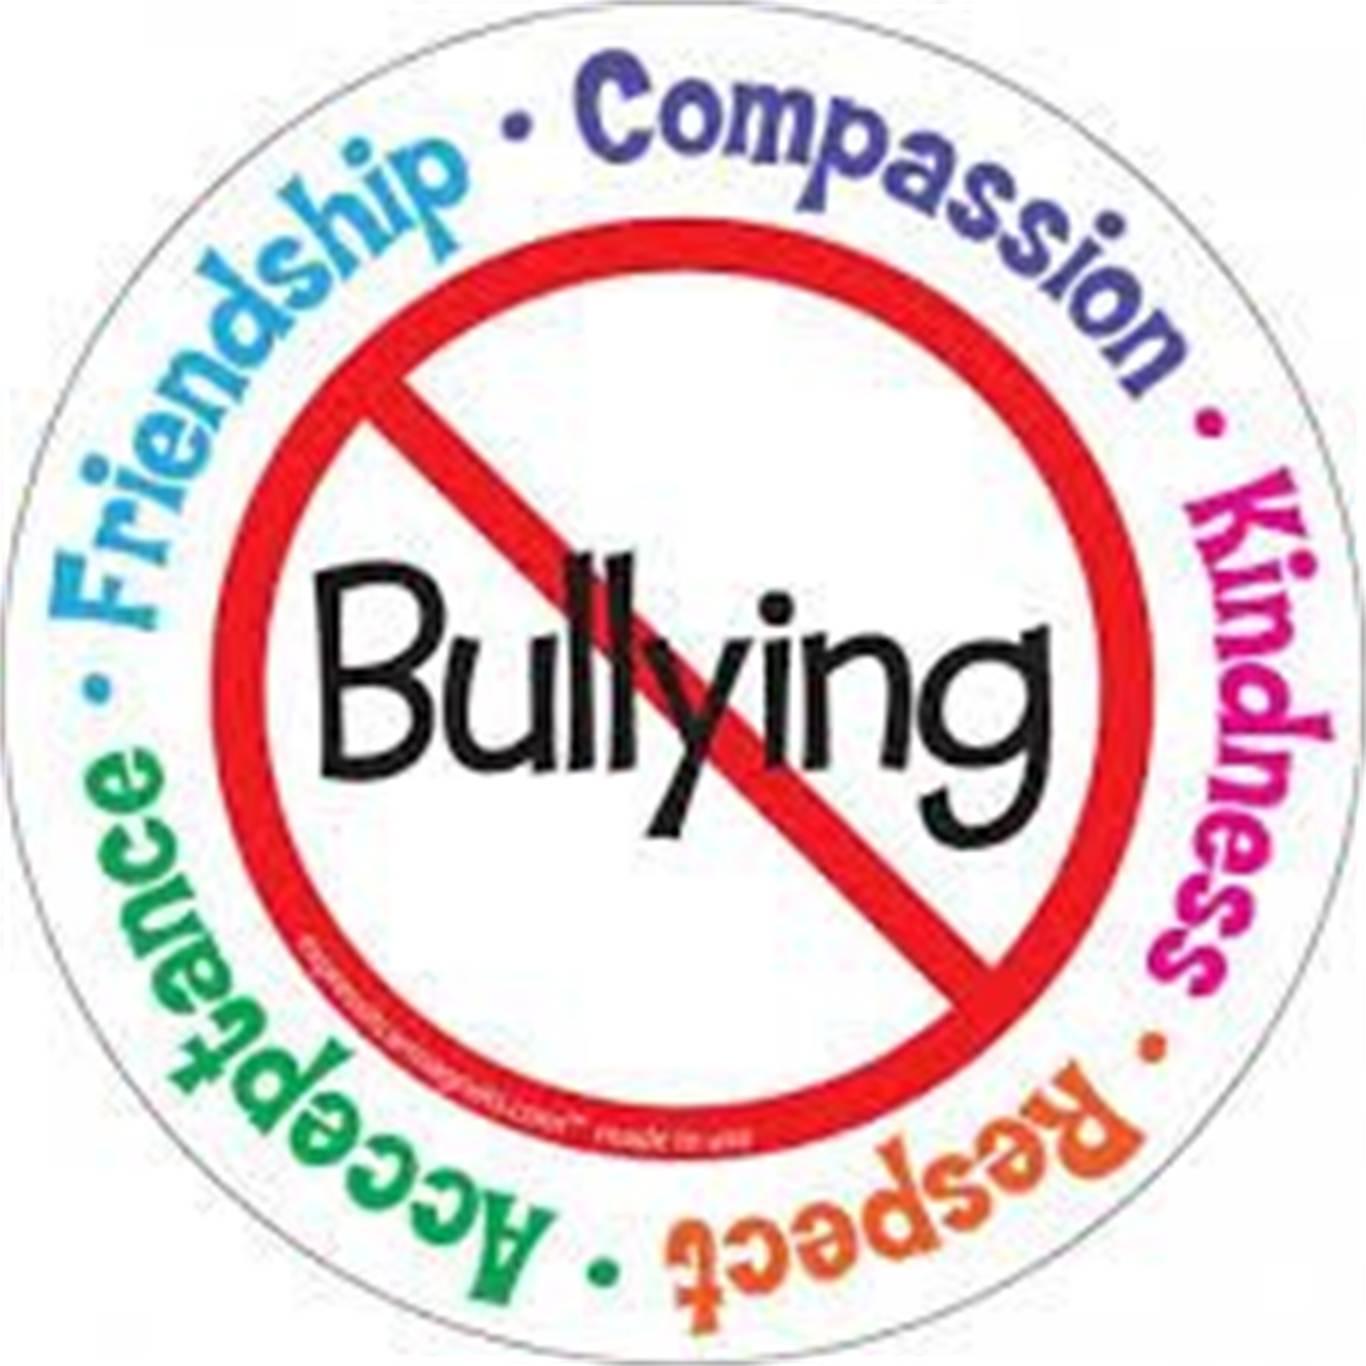 international bullying prevention association